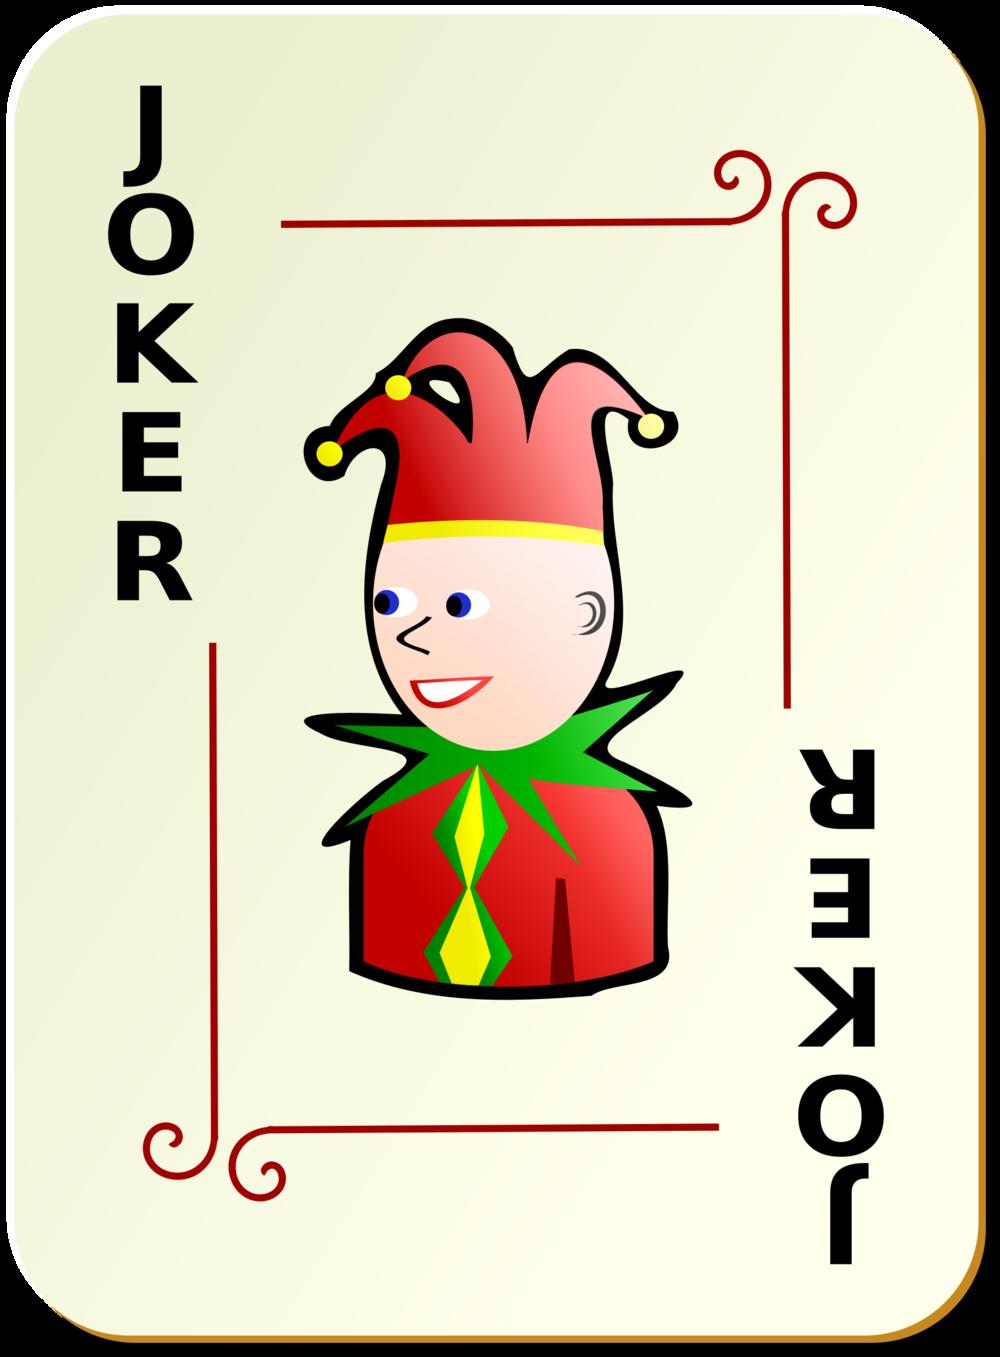 nicubunu-Ornamental-deck-Black-Joker.png